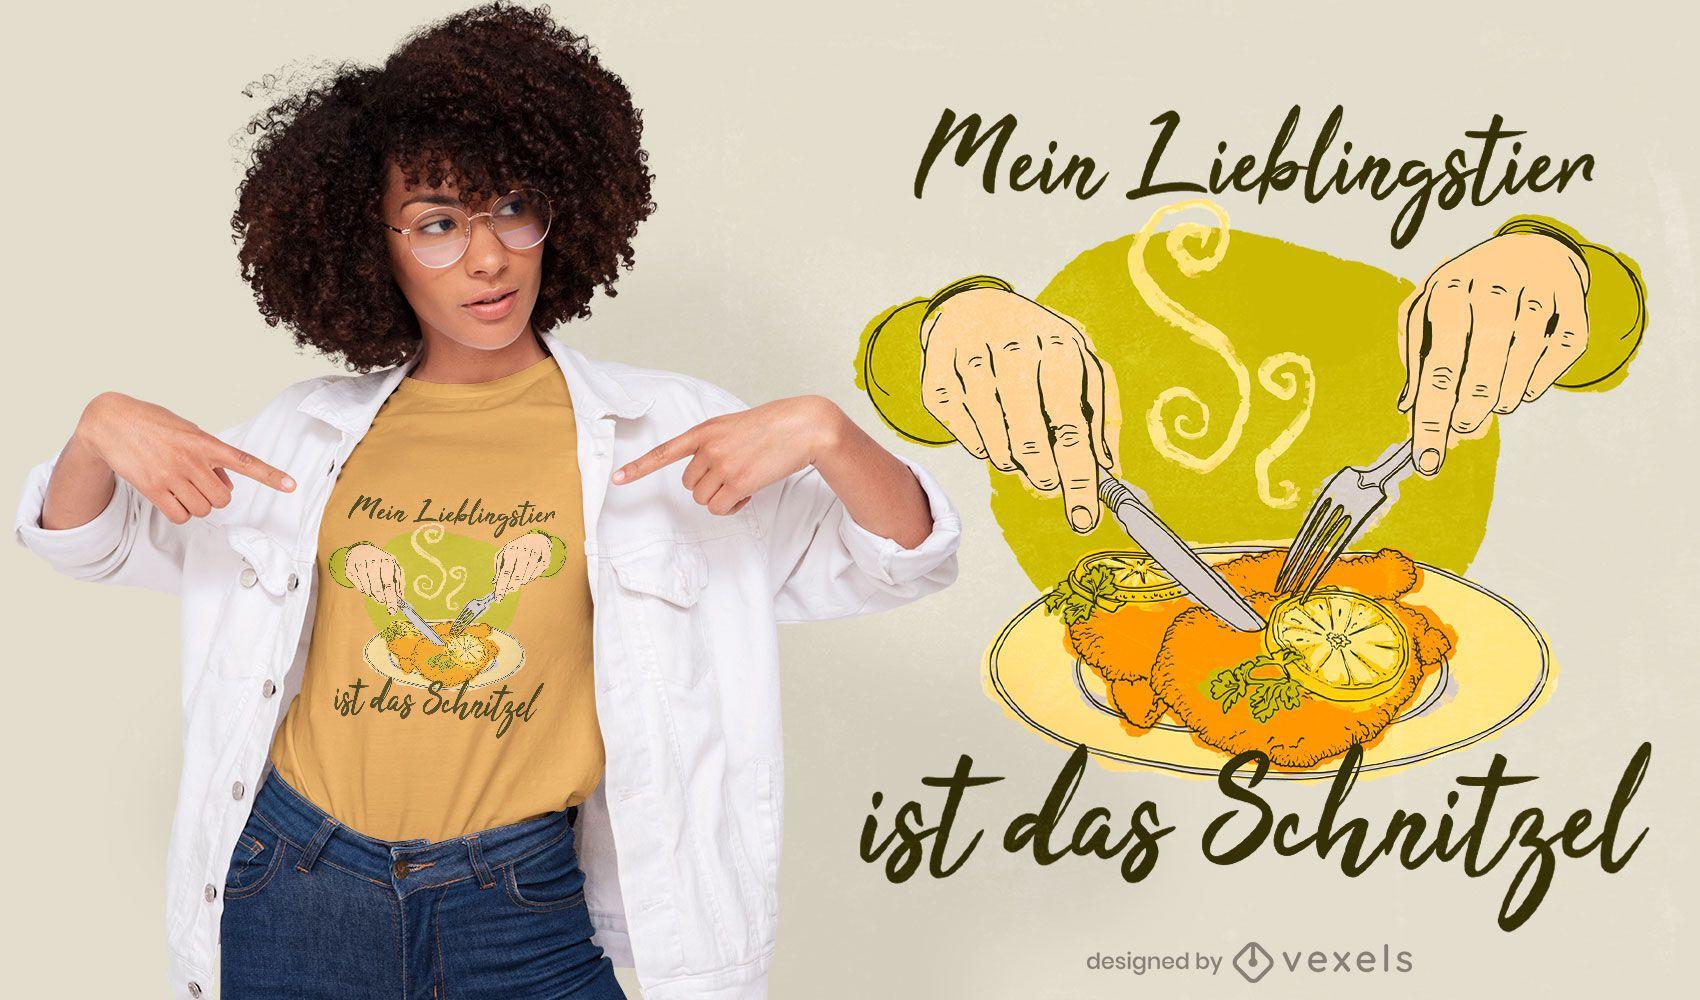 Schnitzel quote t-shirt design